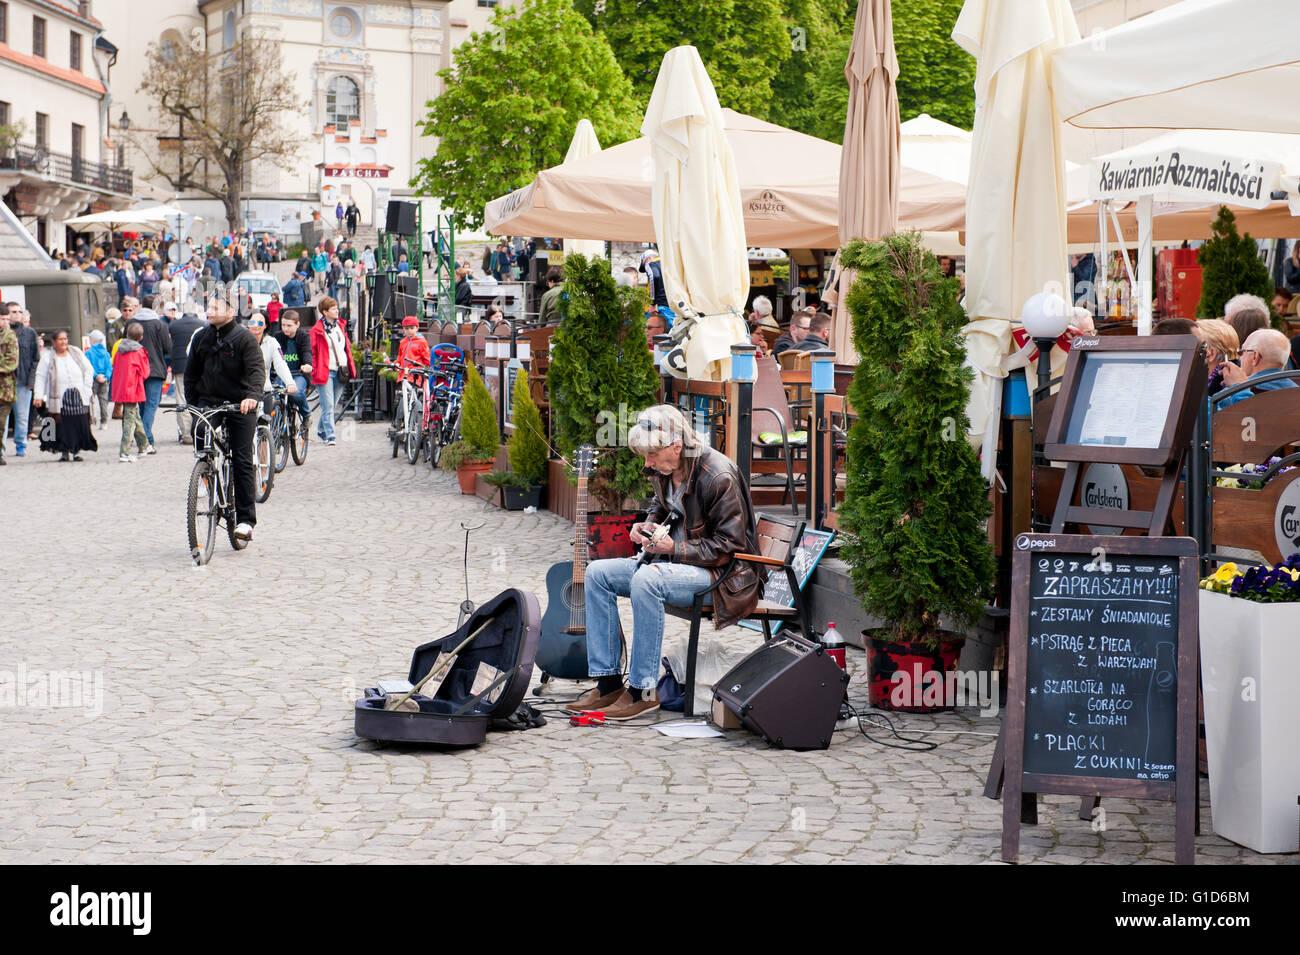 Guitar performer at the market in Kazimierz Dolny, Poland, Europe, bohemian tourist travel destination, sightseeing - Stock Image